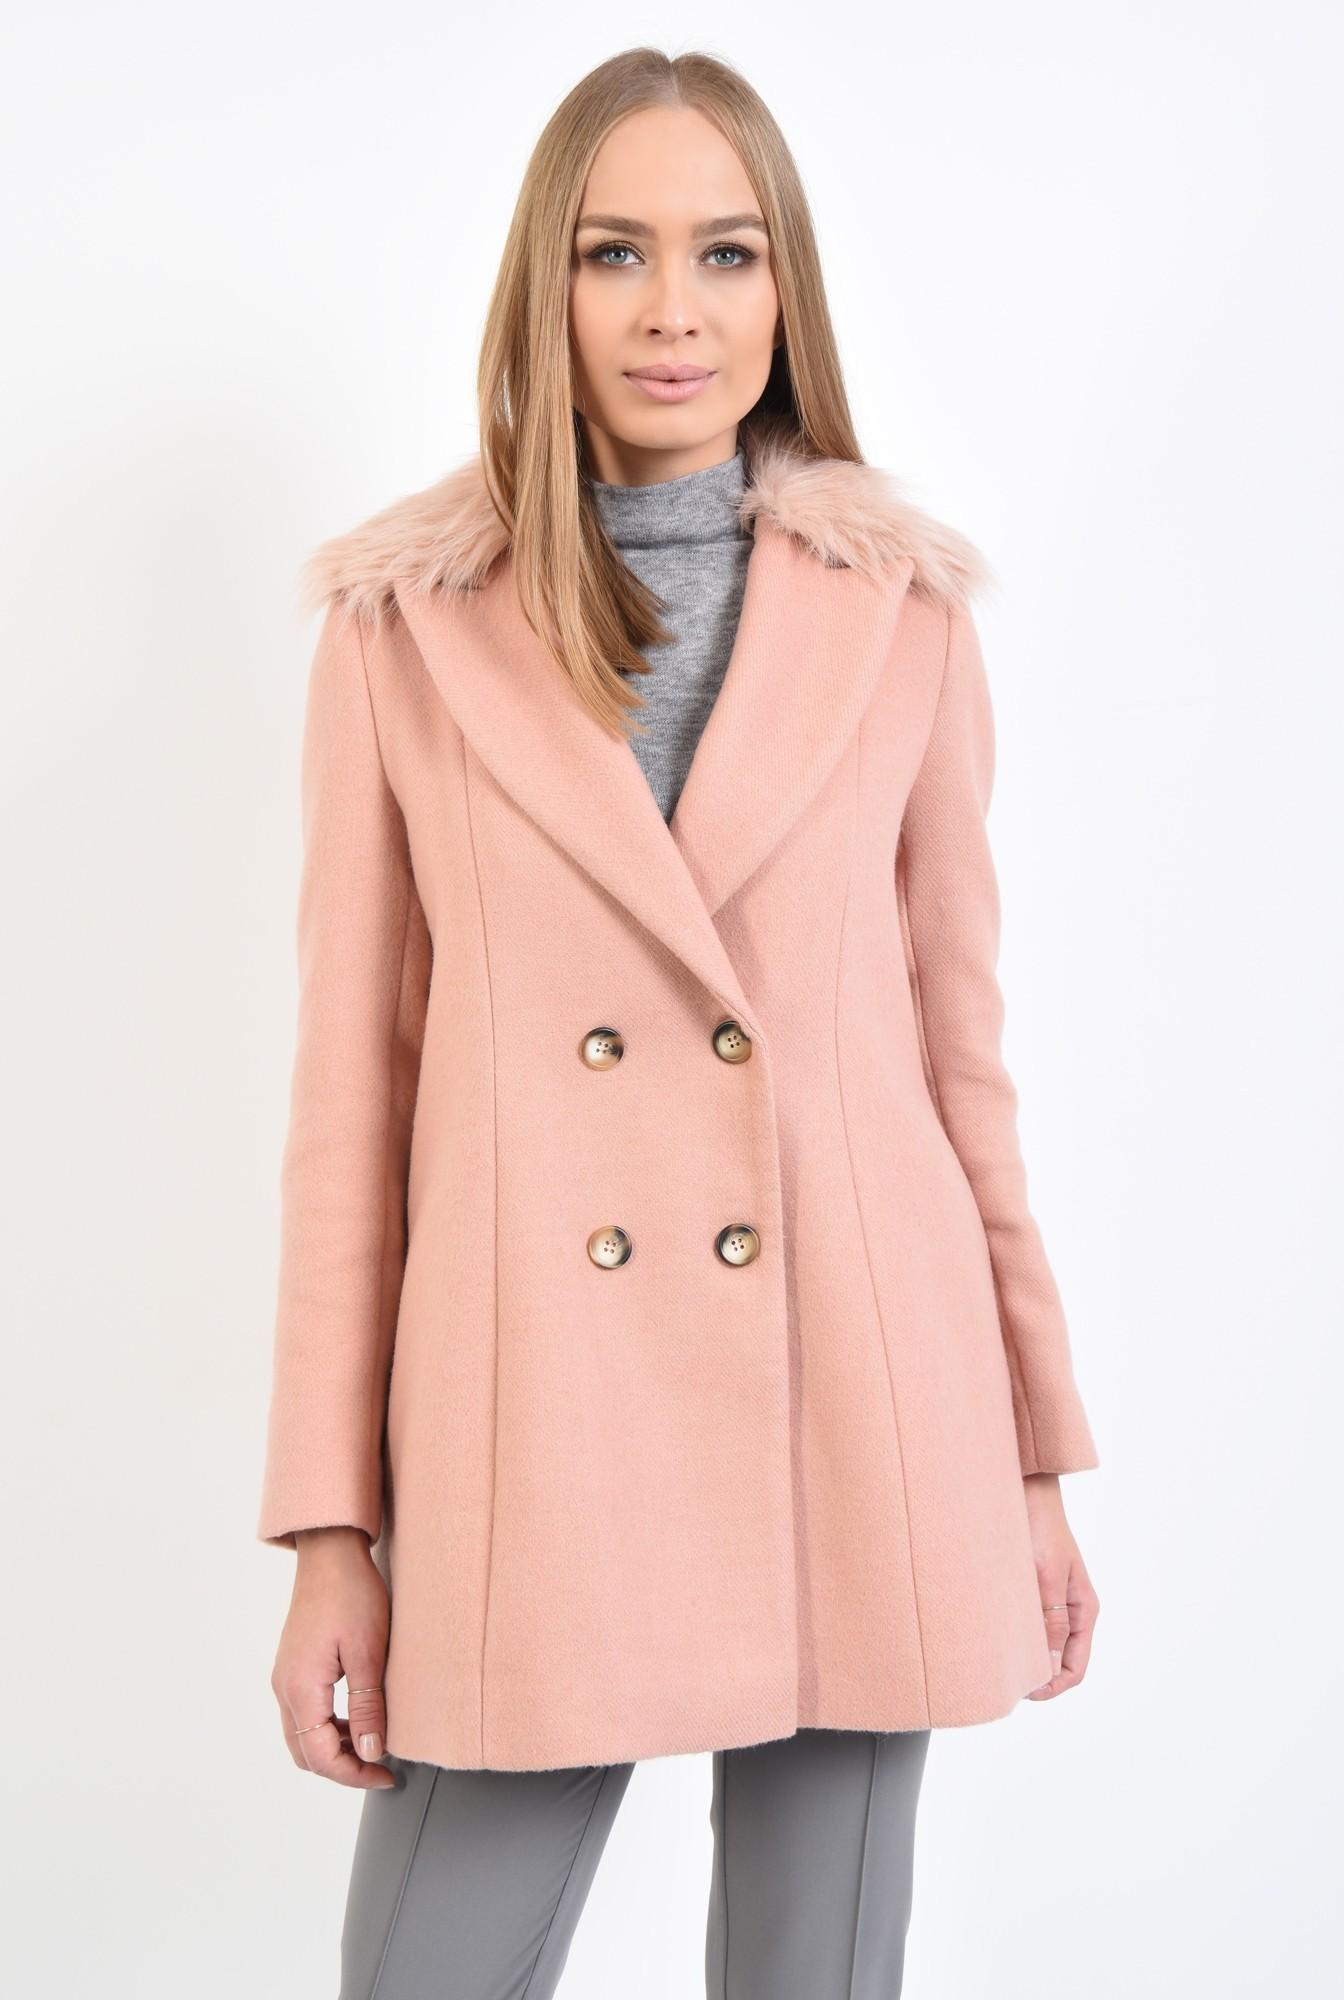 2 - palton din lana, roz, doua randuri de nasturi, guler asortat